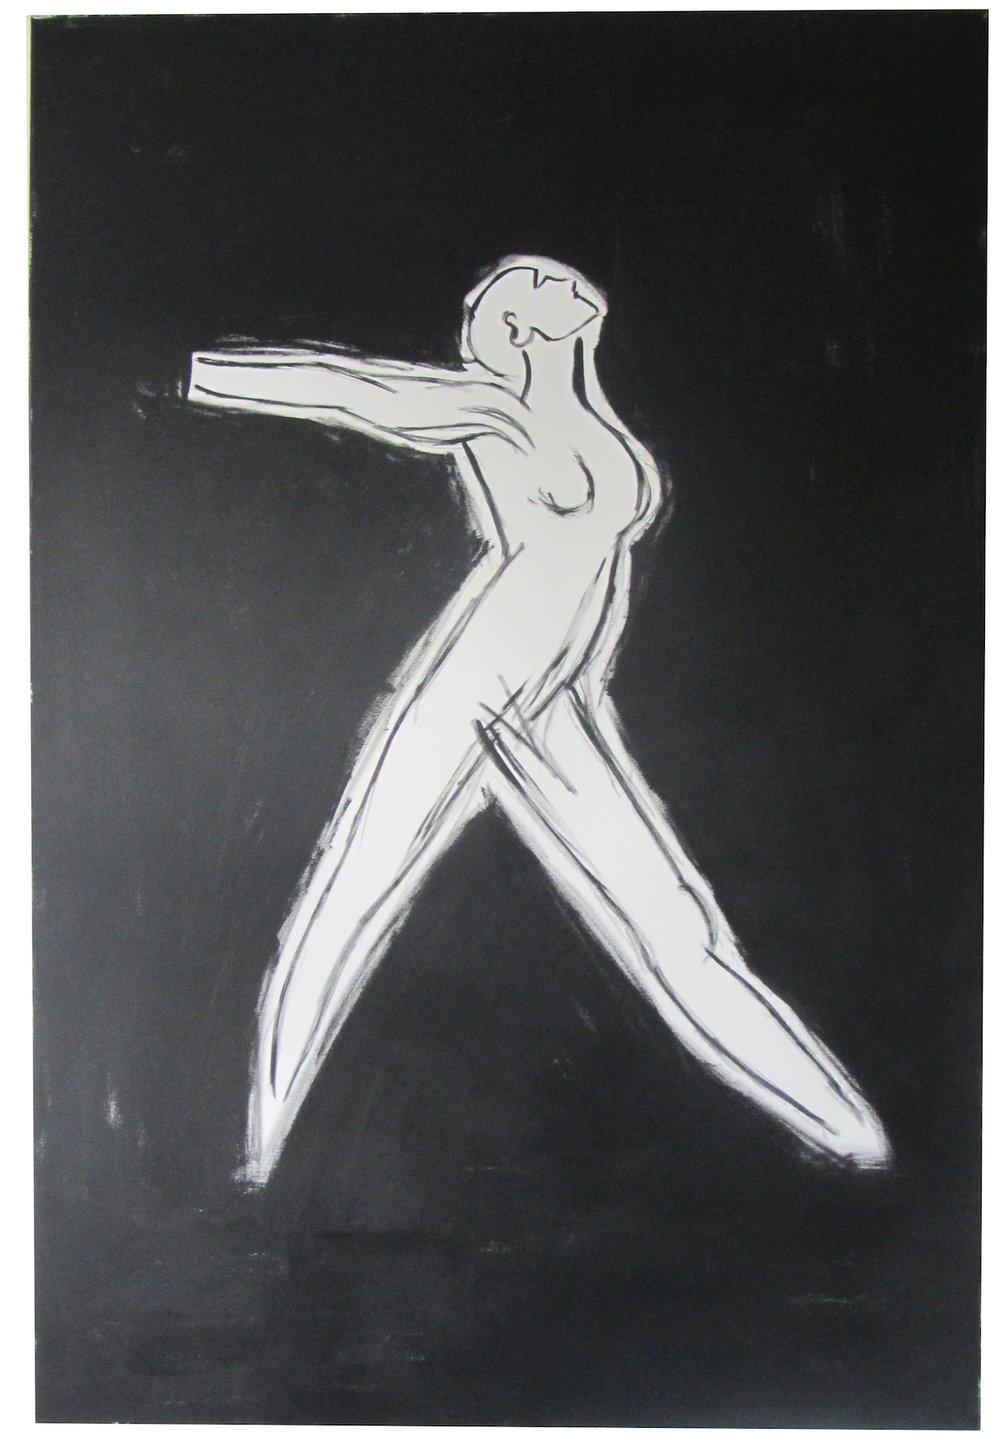 The+Dancer_W110+cm+x+H160+cm.jpg